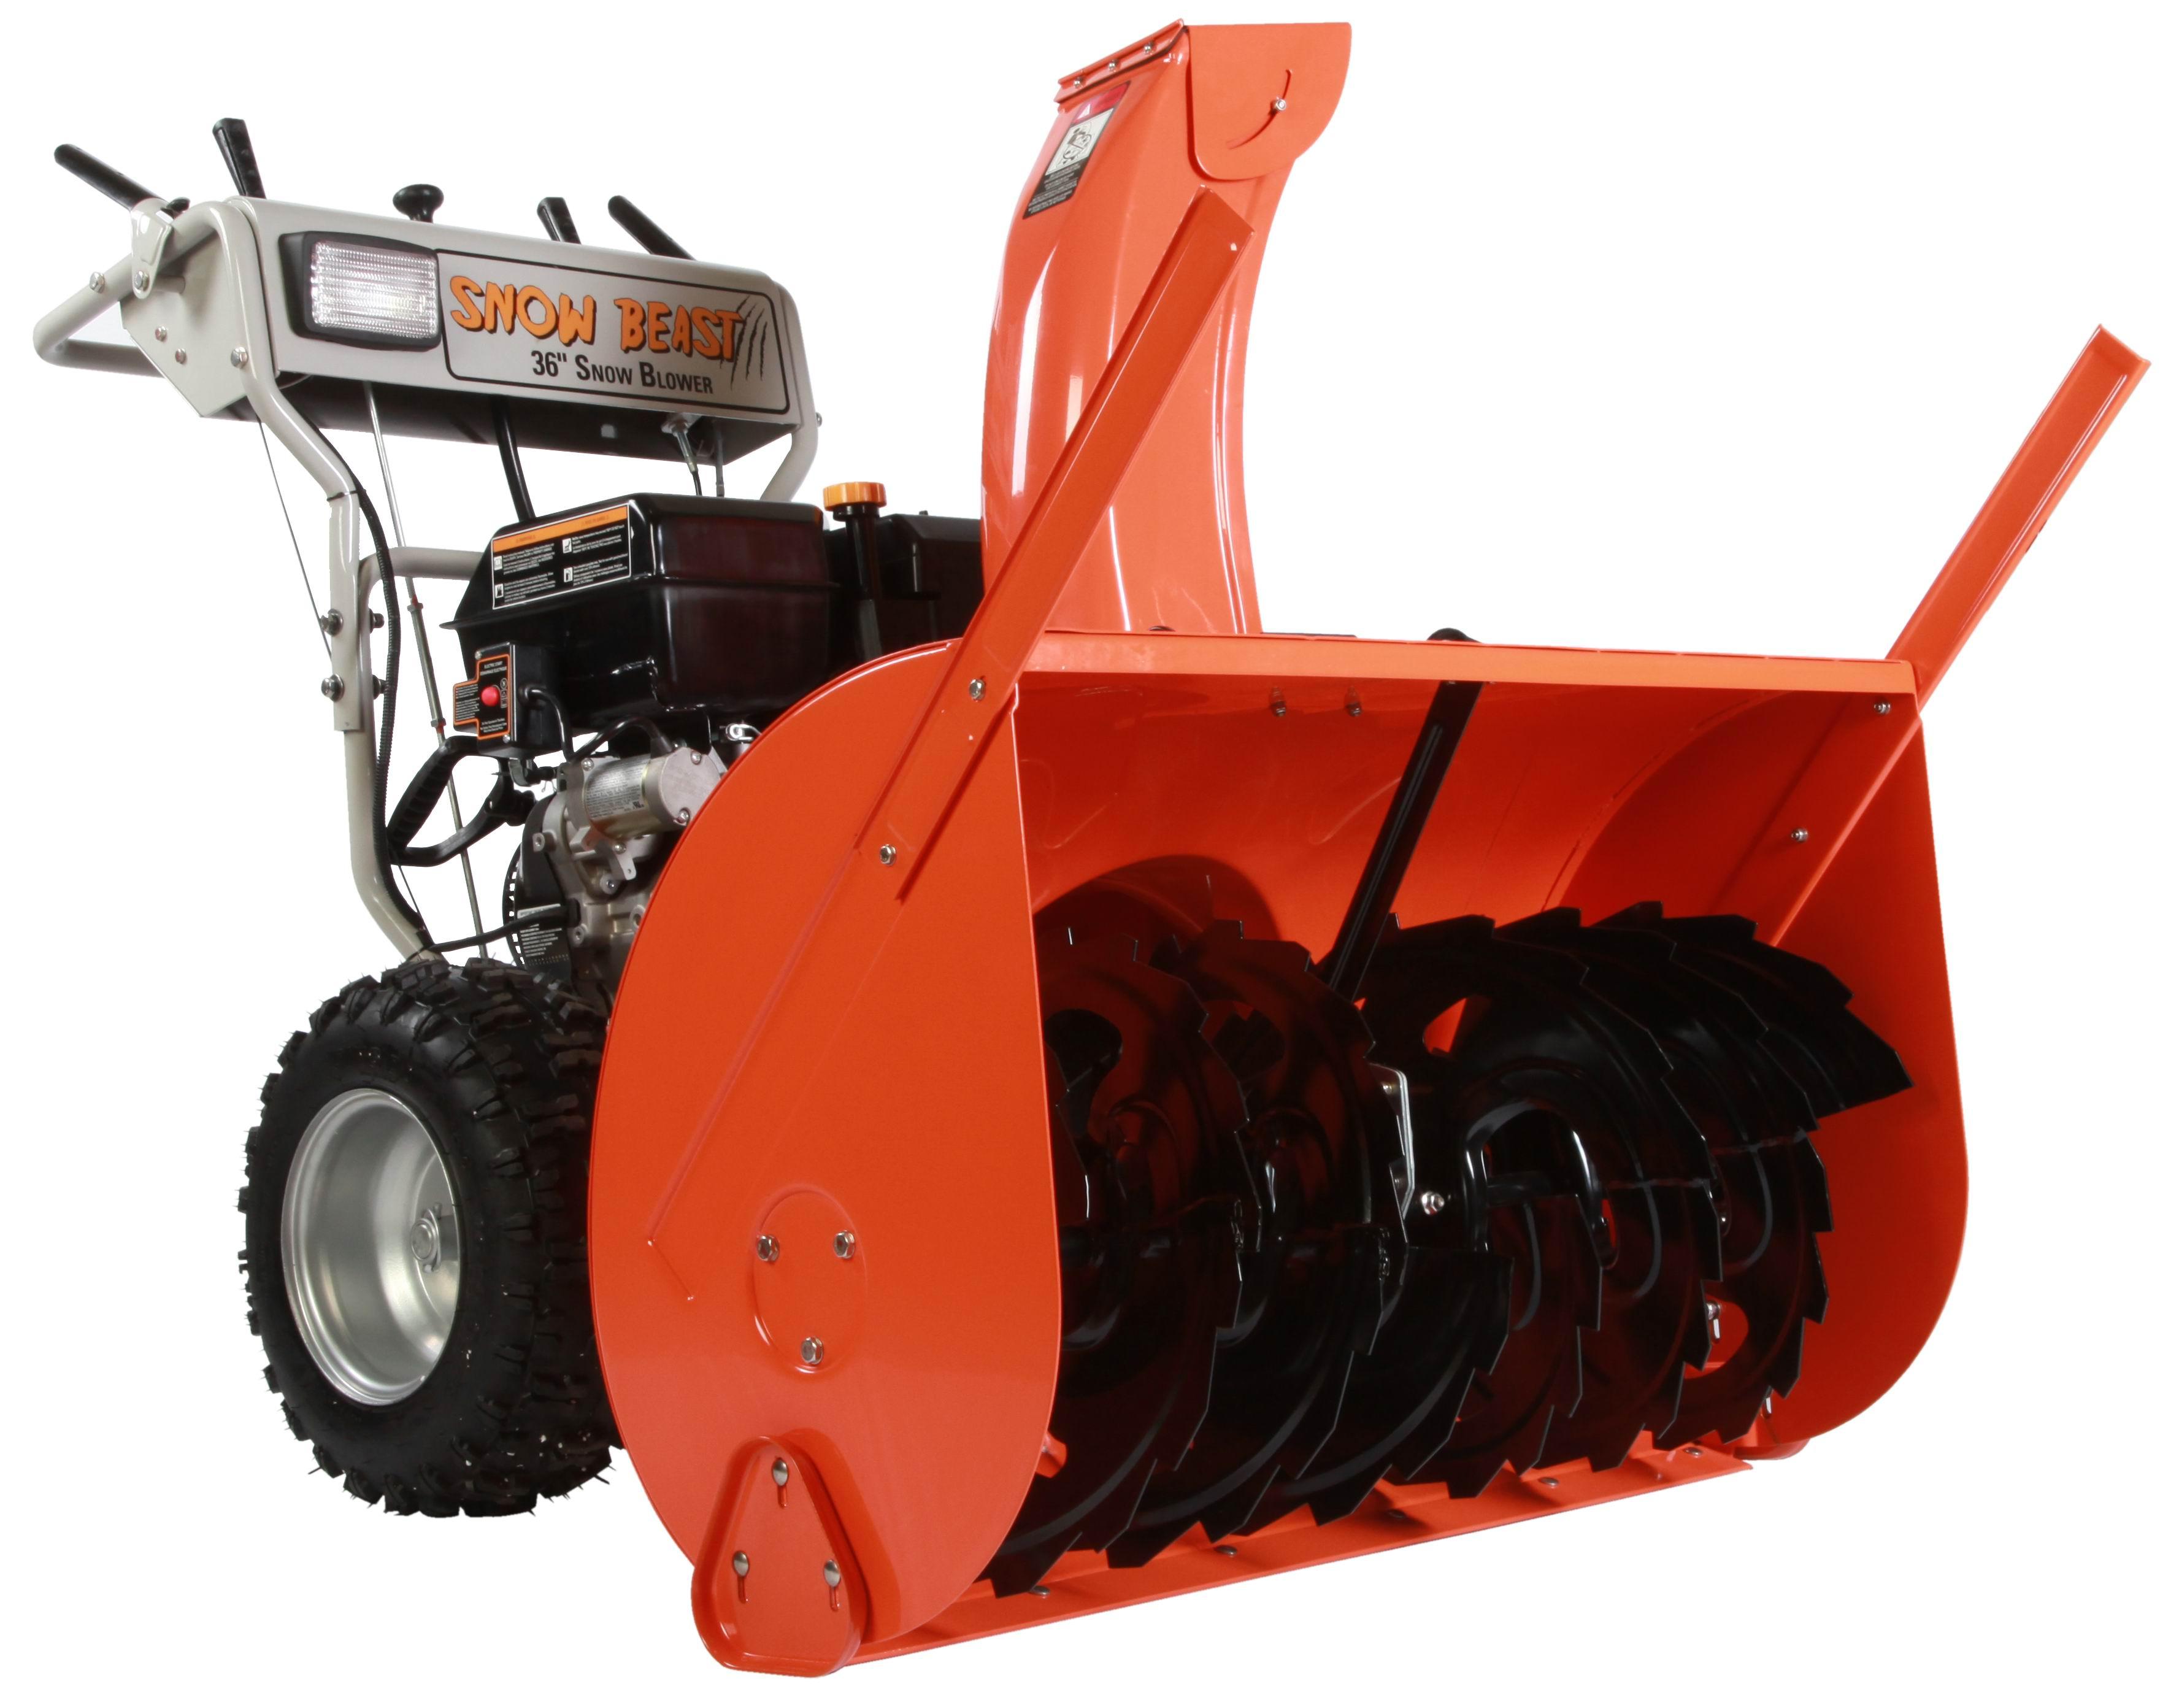 Snow Beast 36SB Snow Blower - H